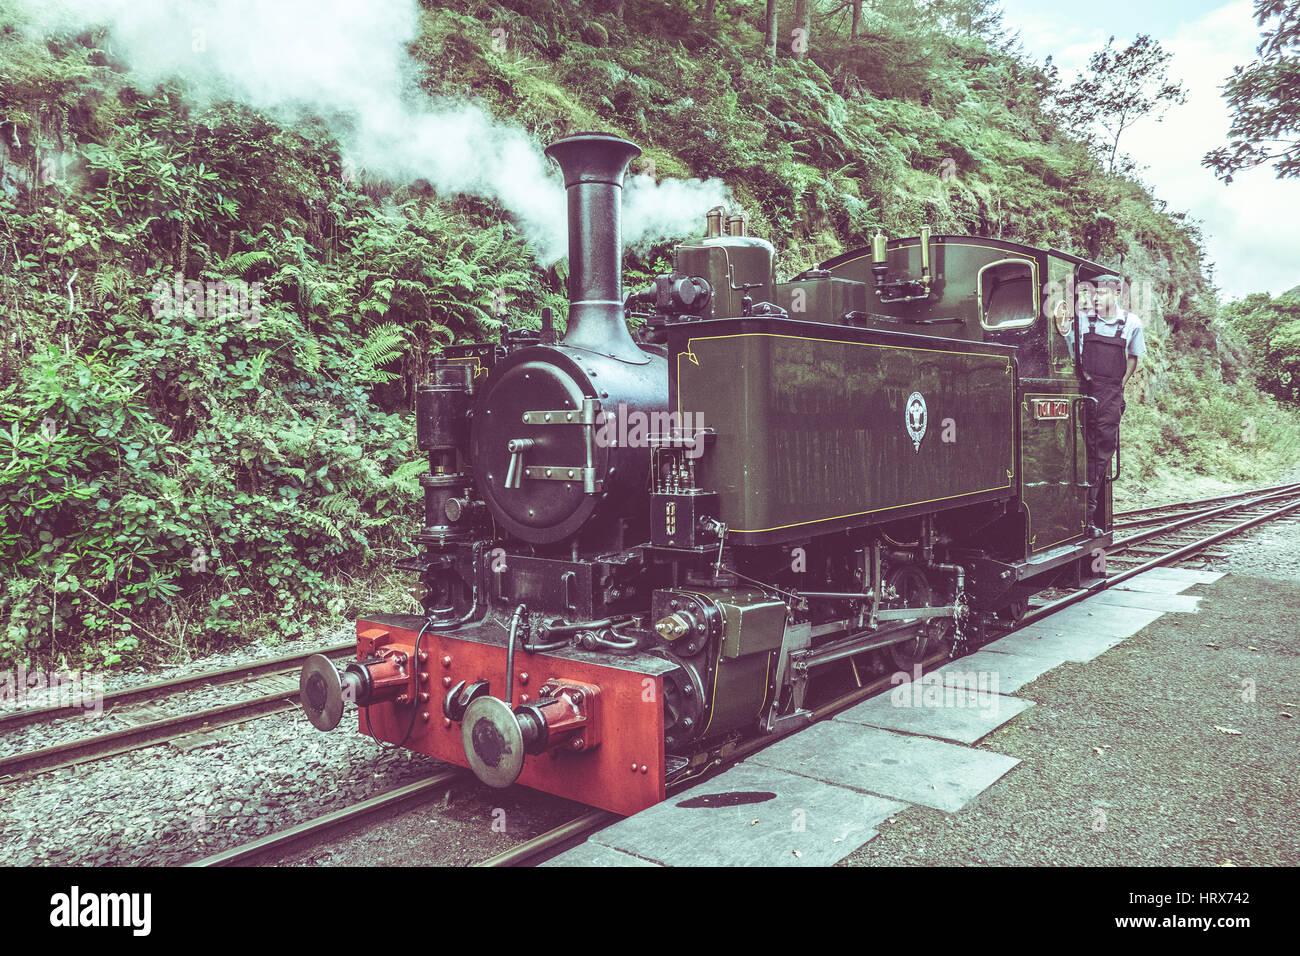 Heritage Train Life - Stock Image